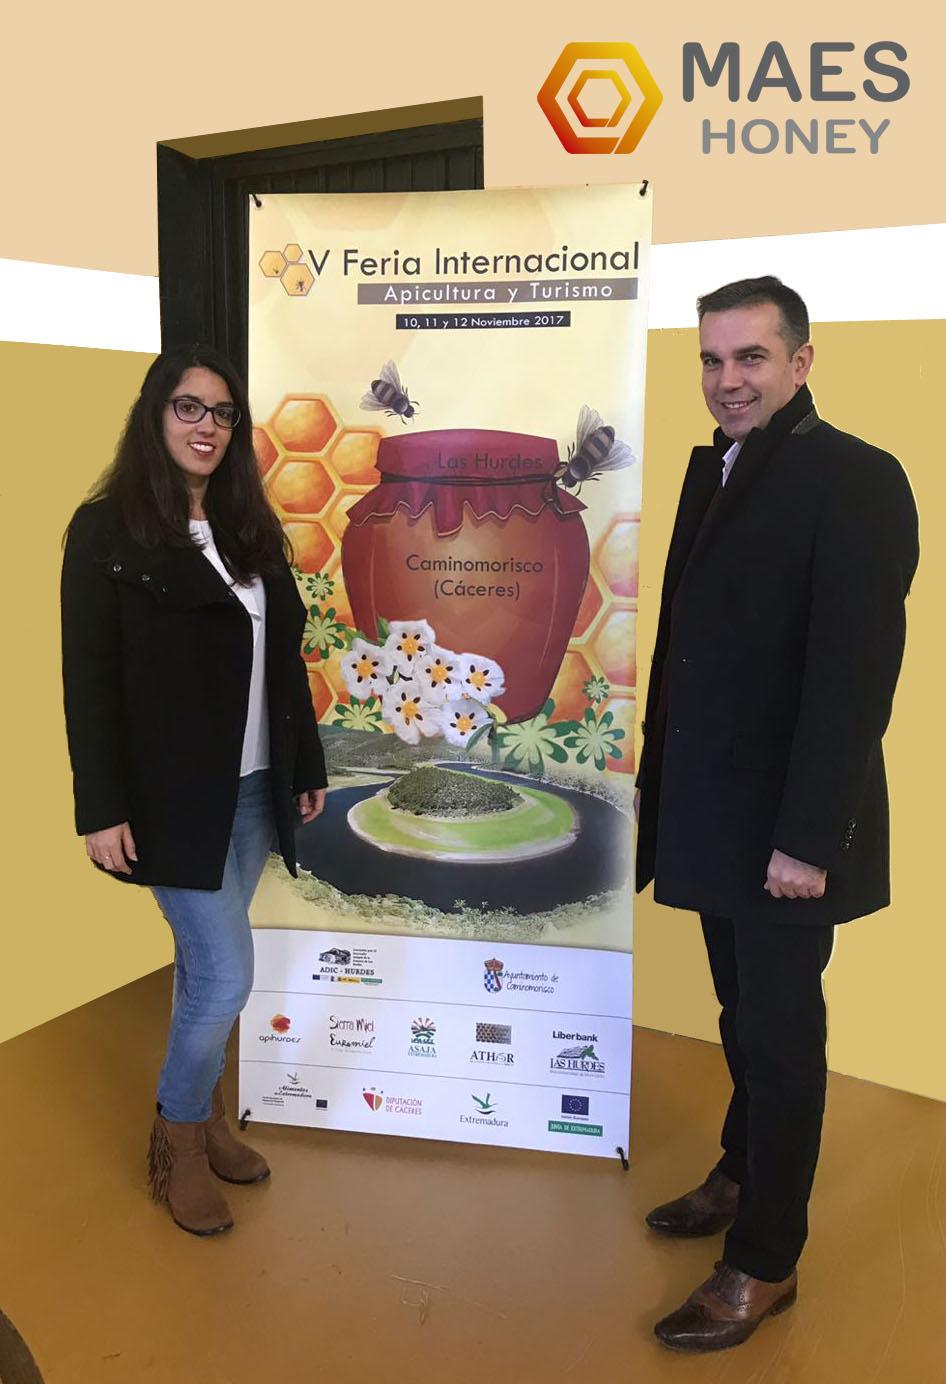 Maes-Honey-en-feria-apicultura-Hurdes-2017